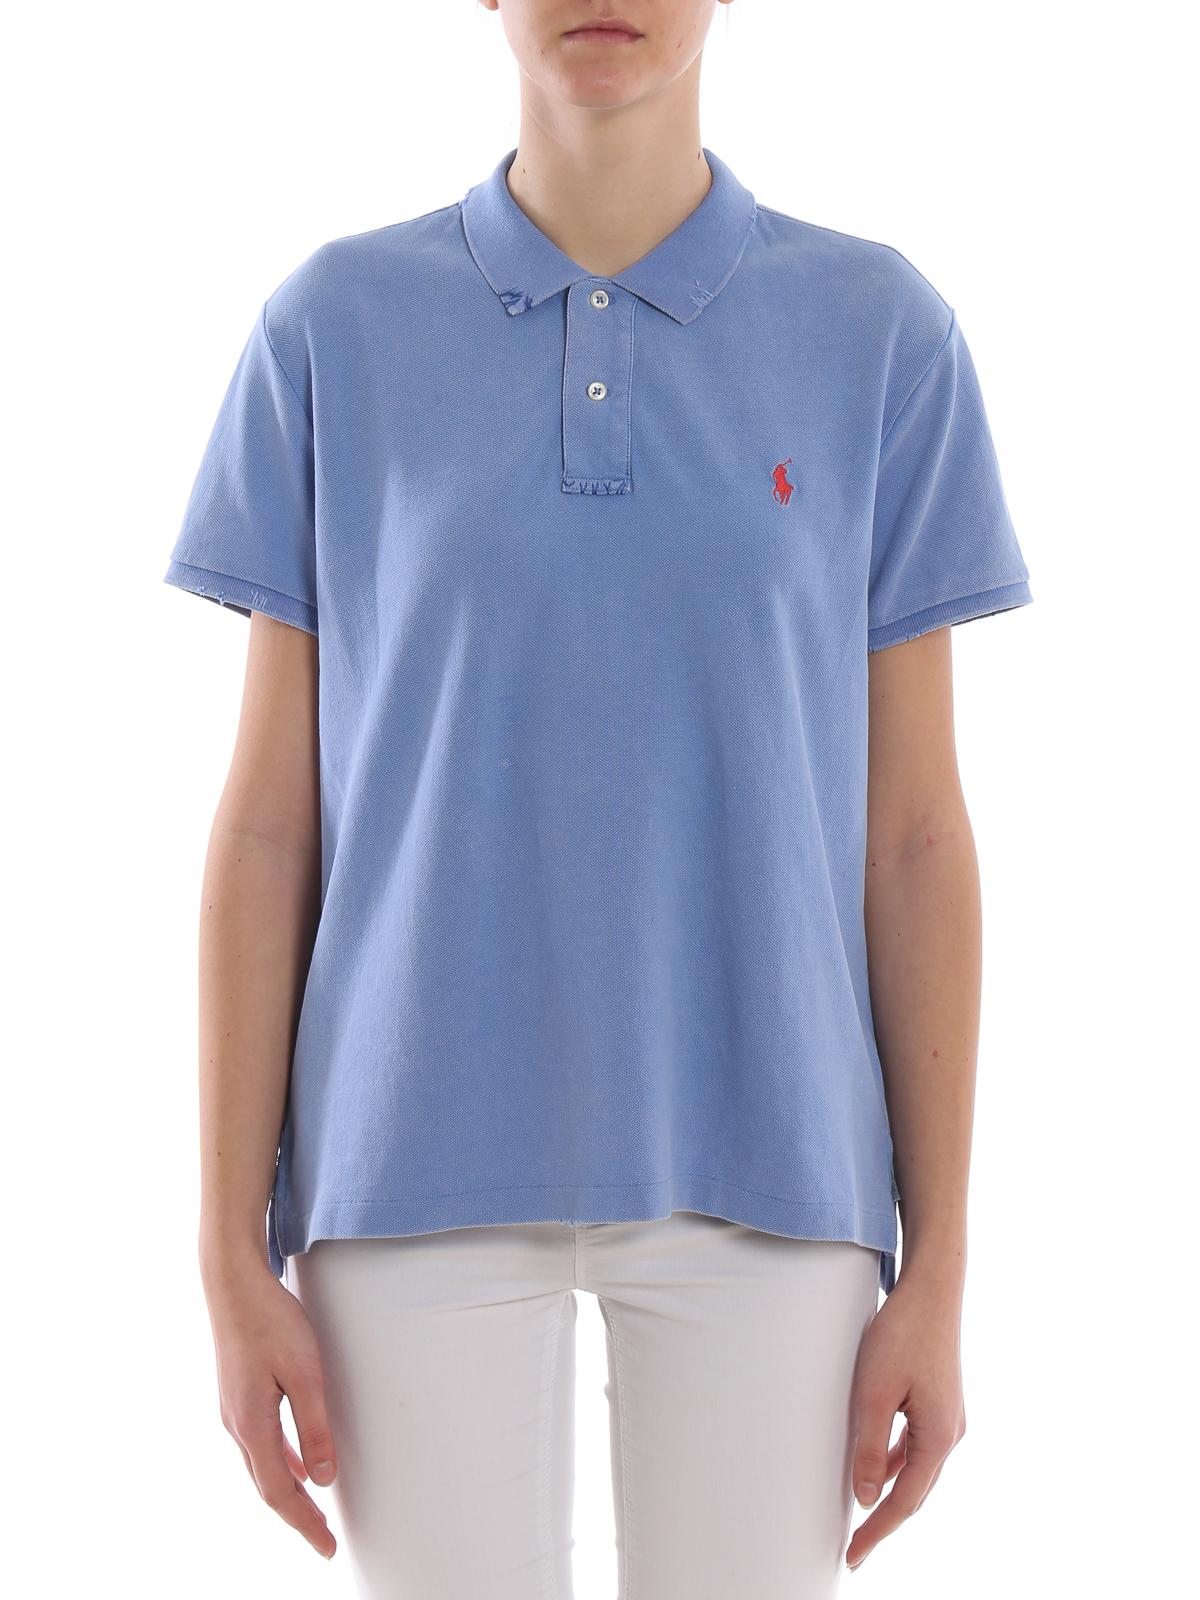 watch 03f7b 48956 Polo Ralph Lauren - Poloshirt - Blau - Poloshirts - 211744518005